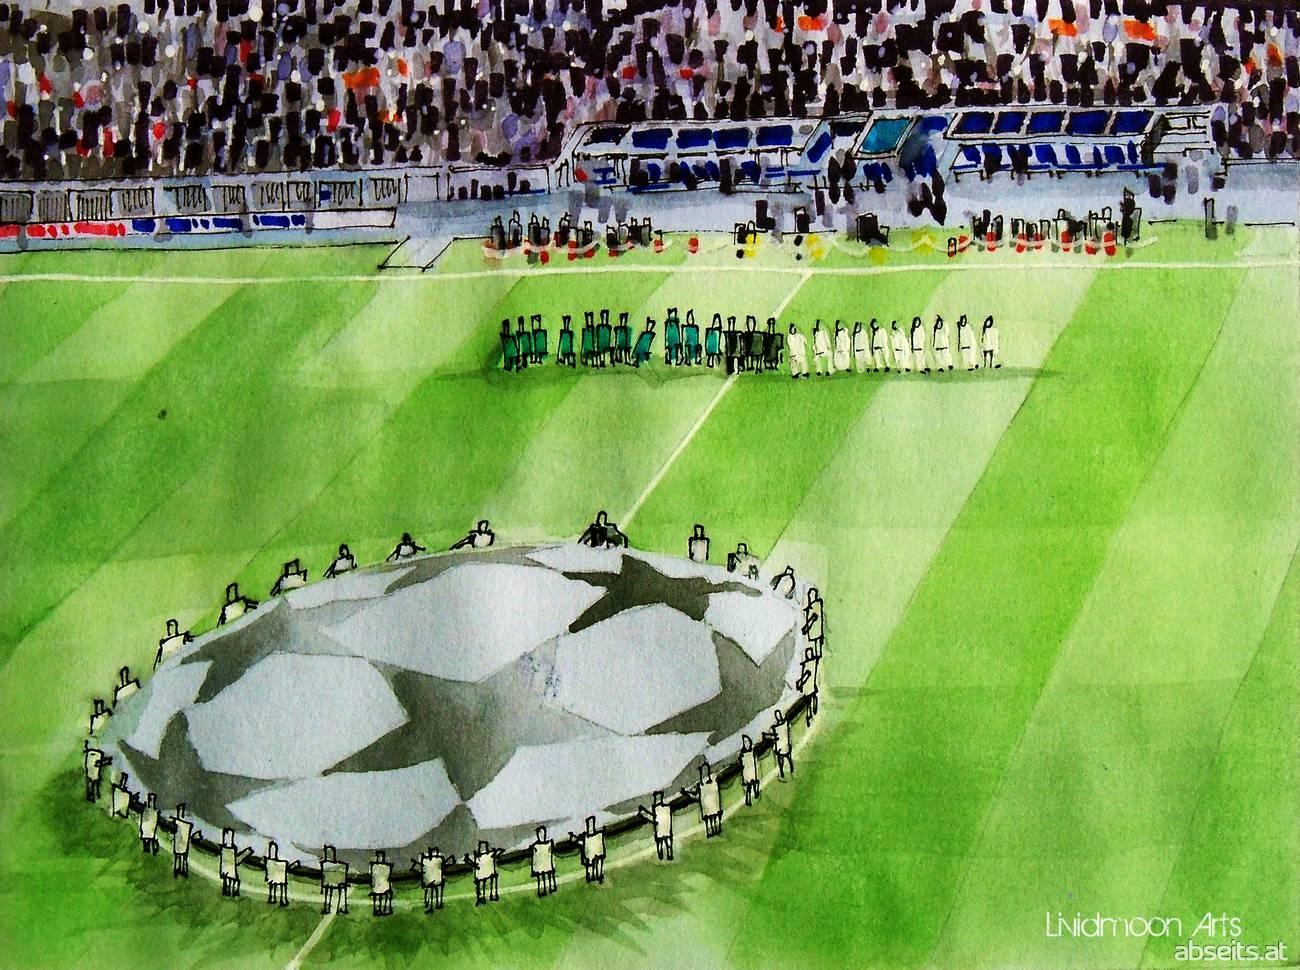 Champions League vor dem Spiel_abseits.at